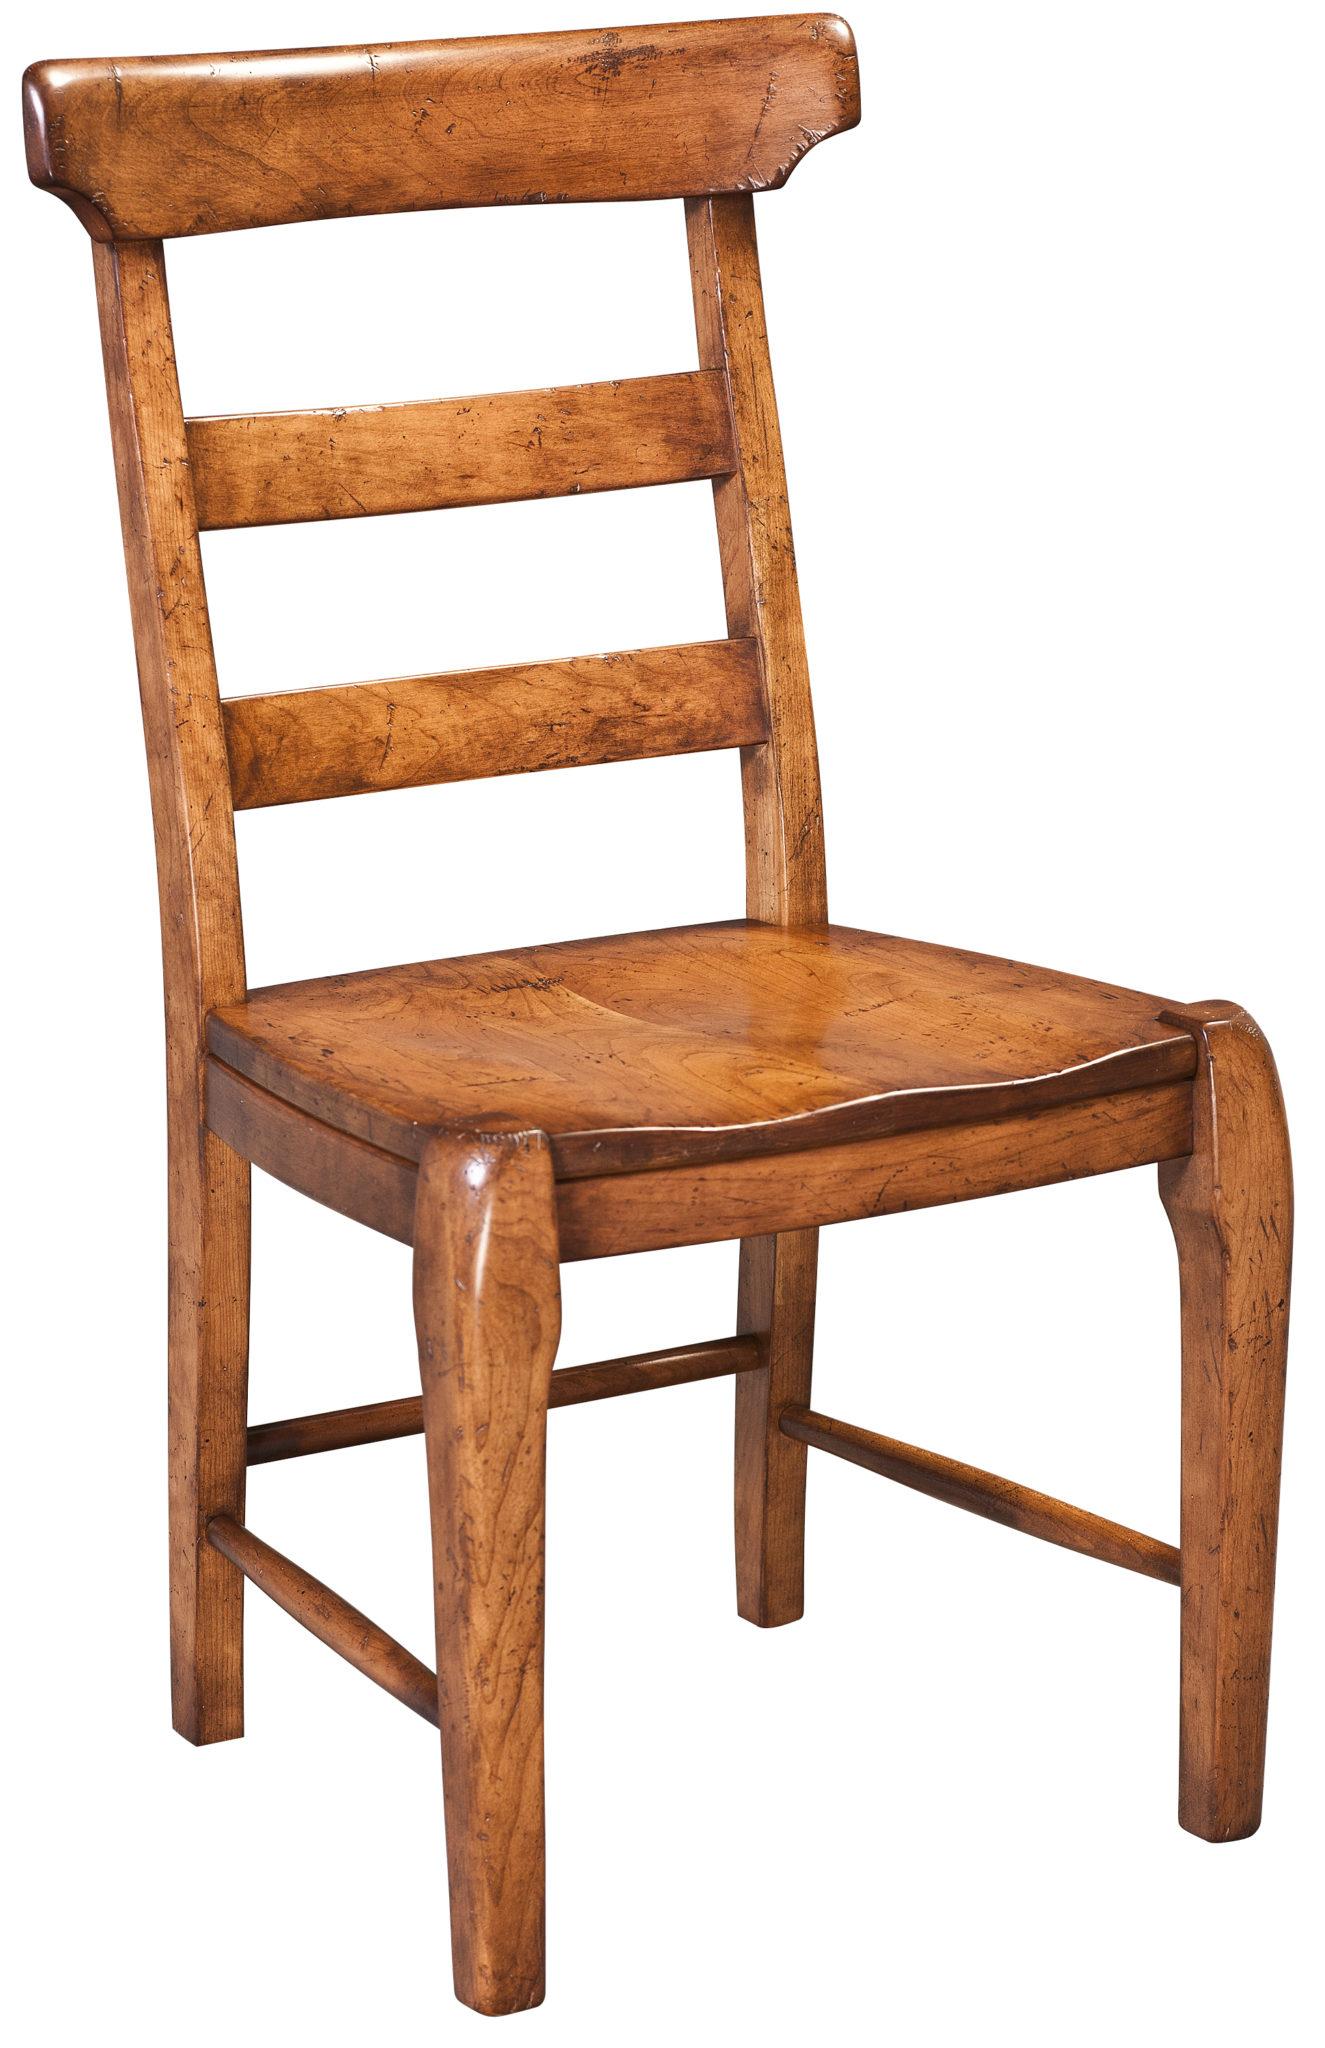 324W-Yorkshire-Arm-Chair.jpg